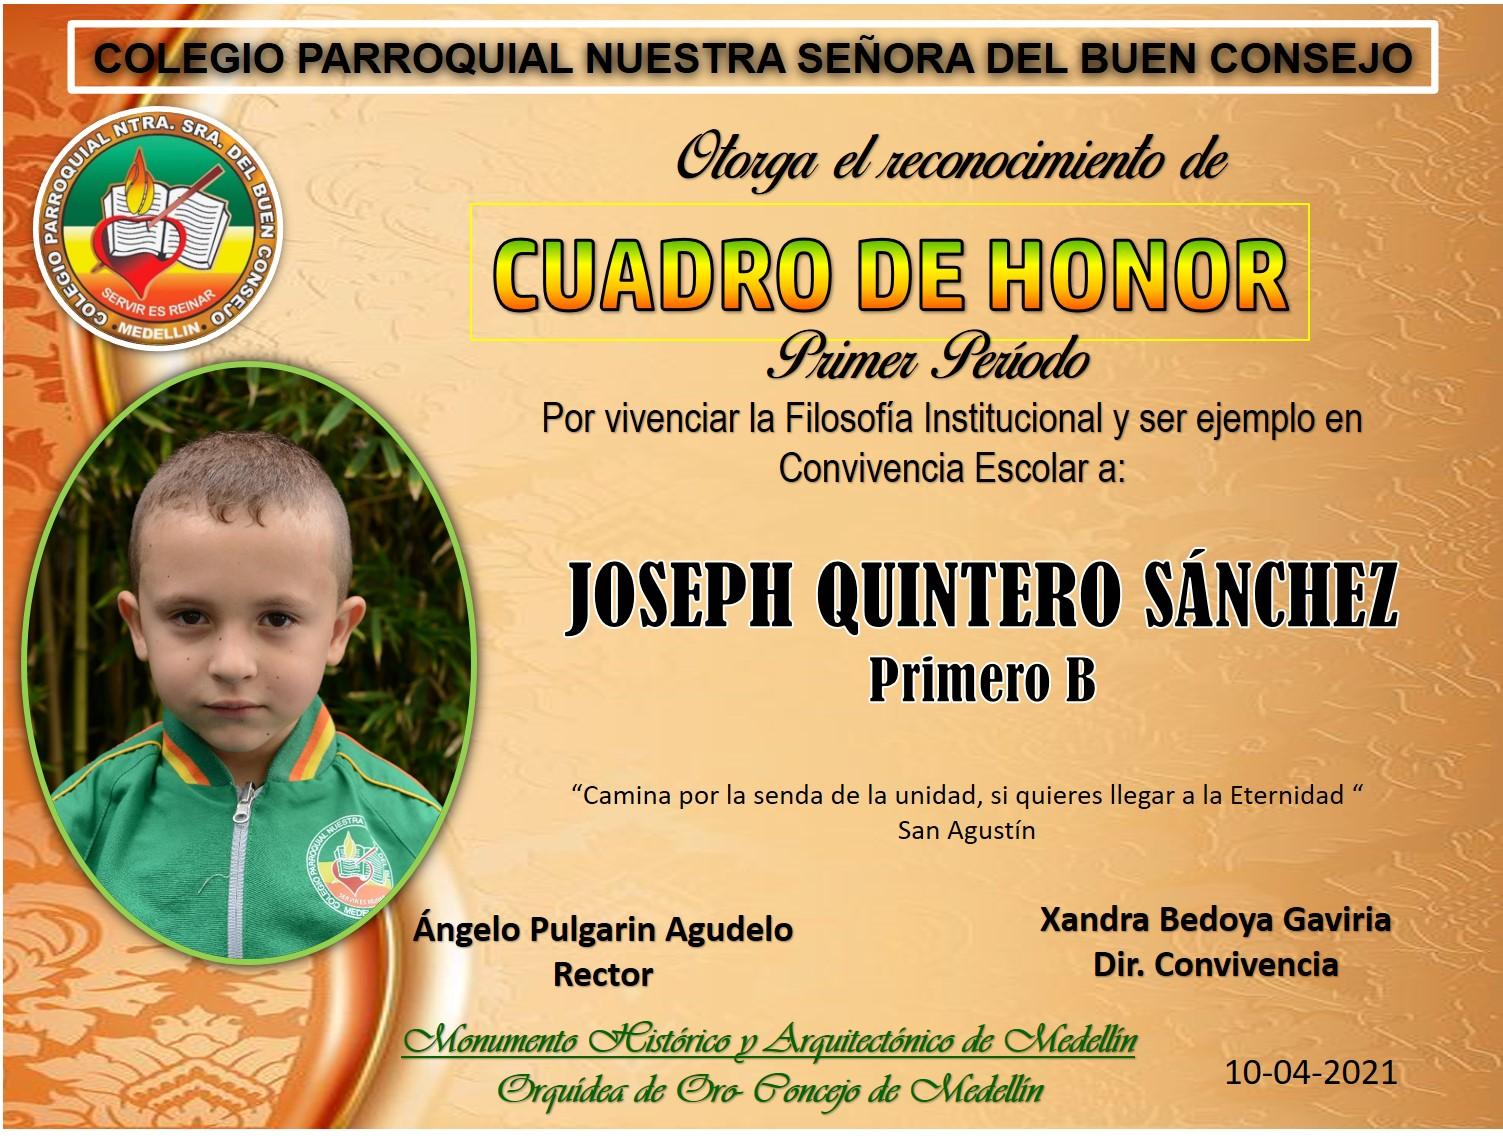 1°B  JOSEPH QUINTERO SÁNCHEZ